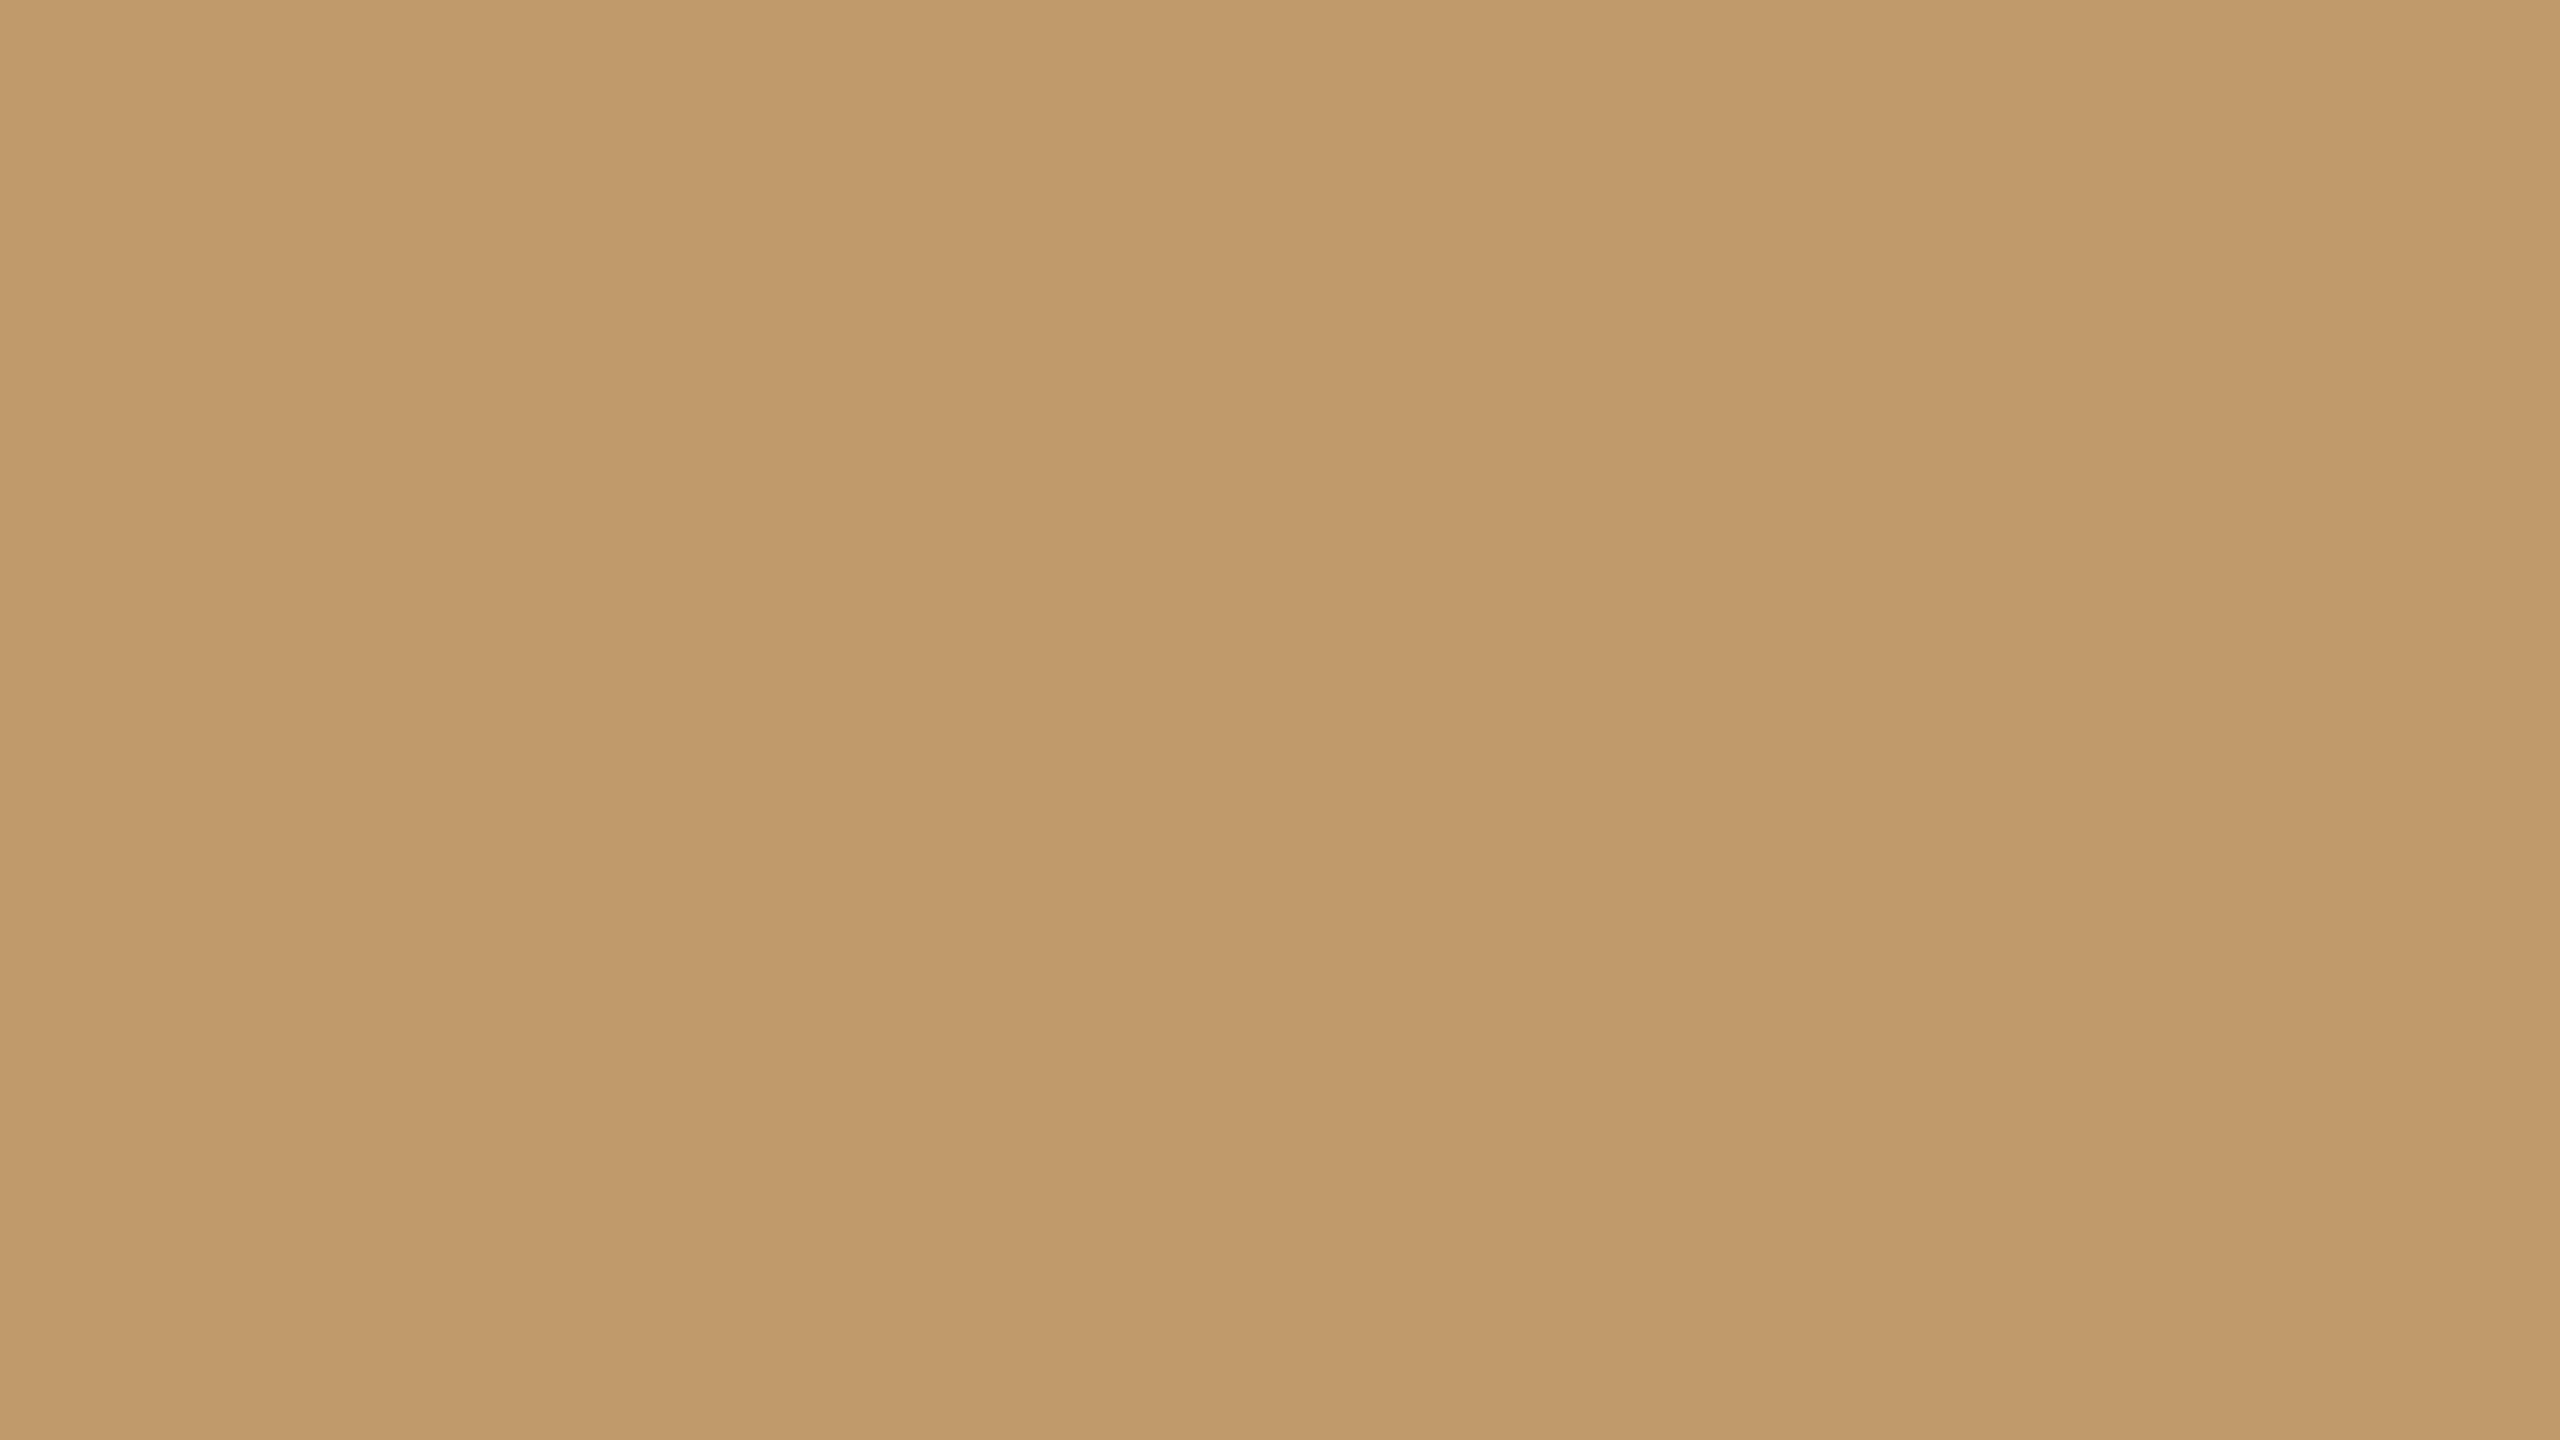 2560x1440 Desert Solid Color Background